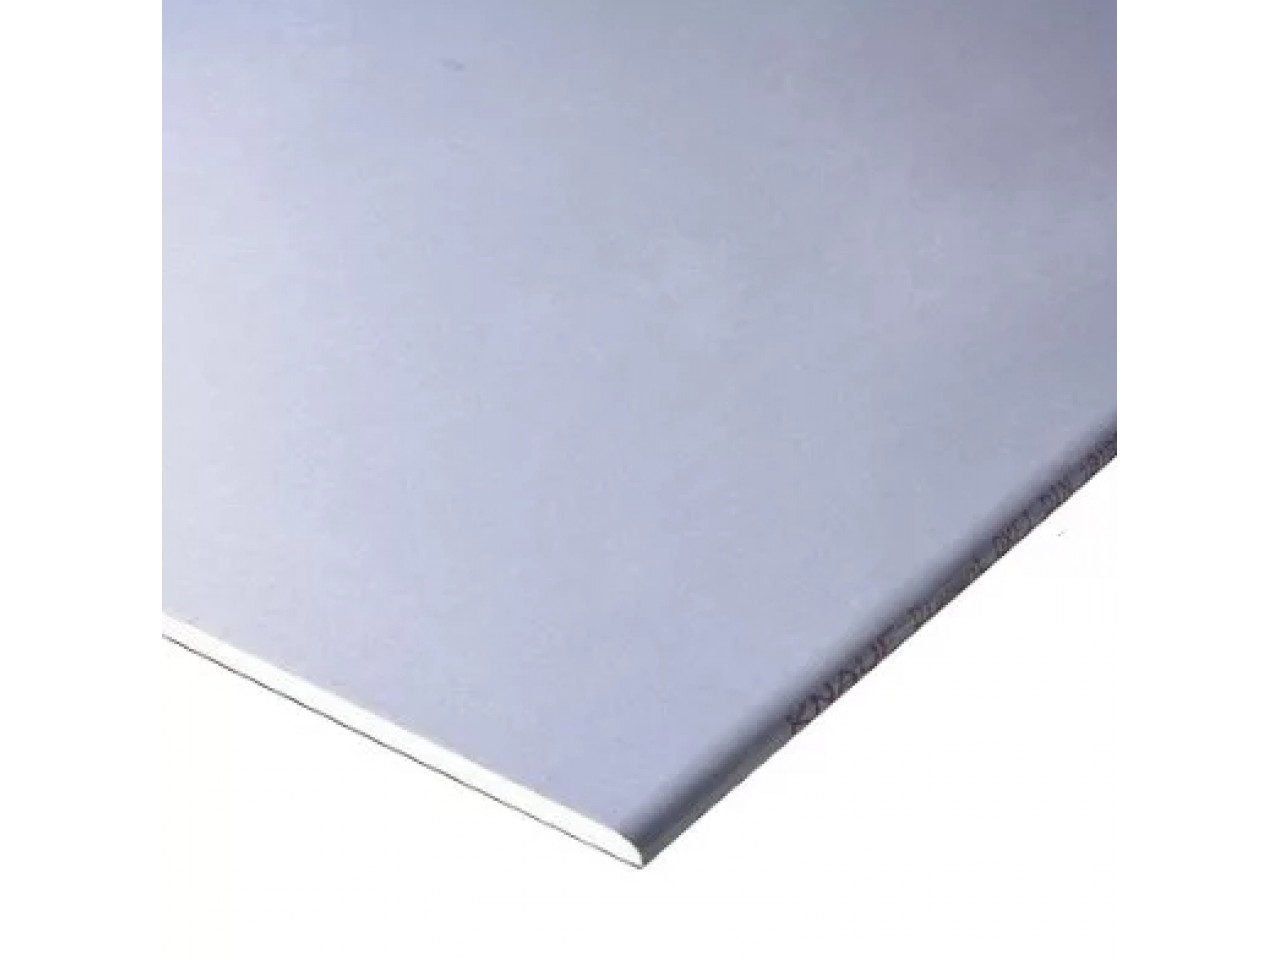 Гипсокартон стеновой KNAUF ТИТАН влаго-огнестойкий 12,5x1200x2500 мм